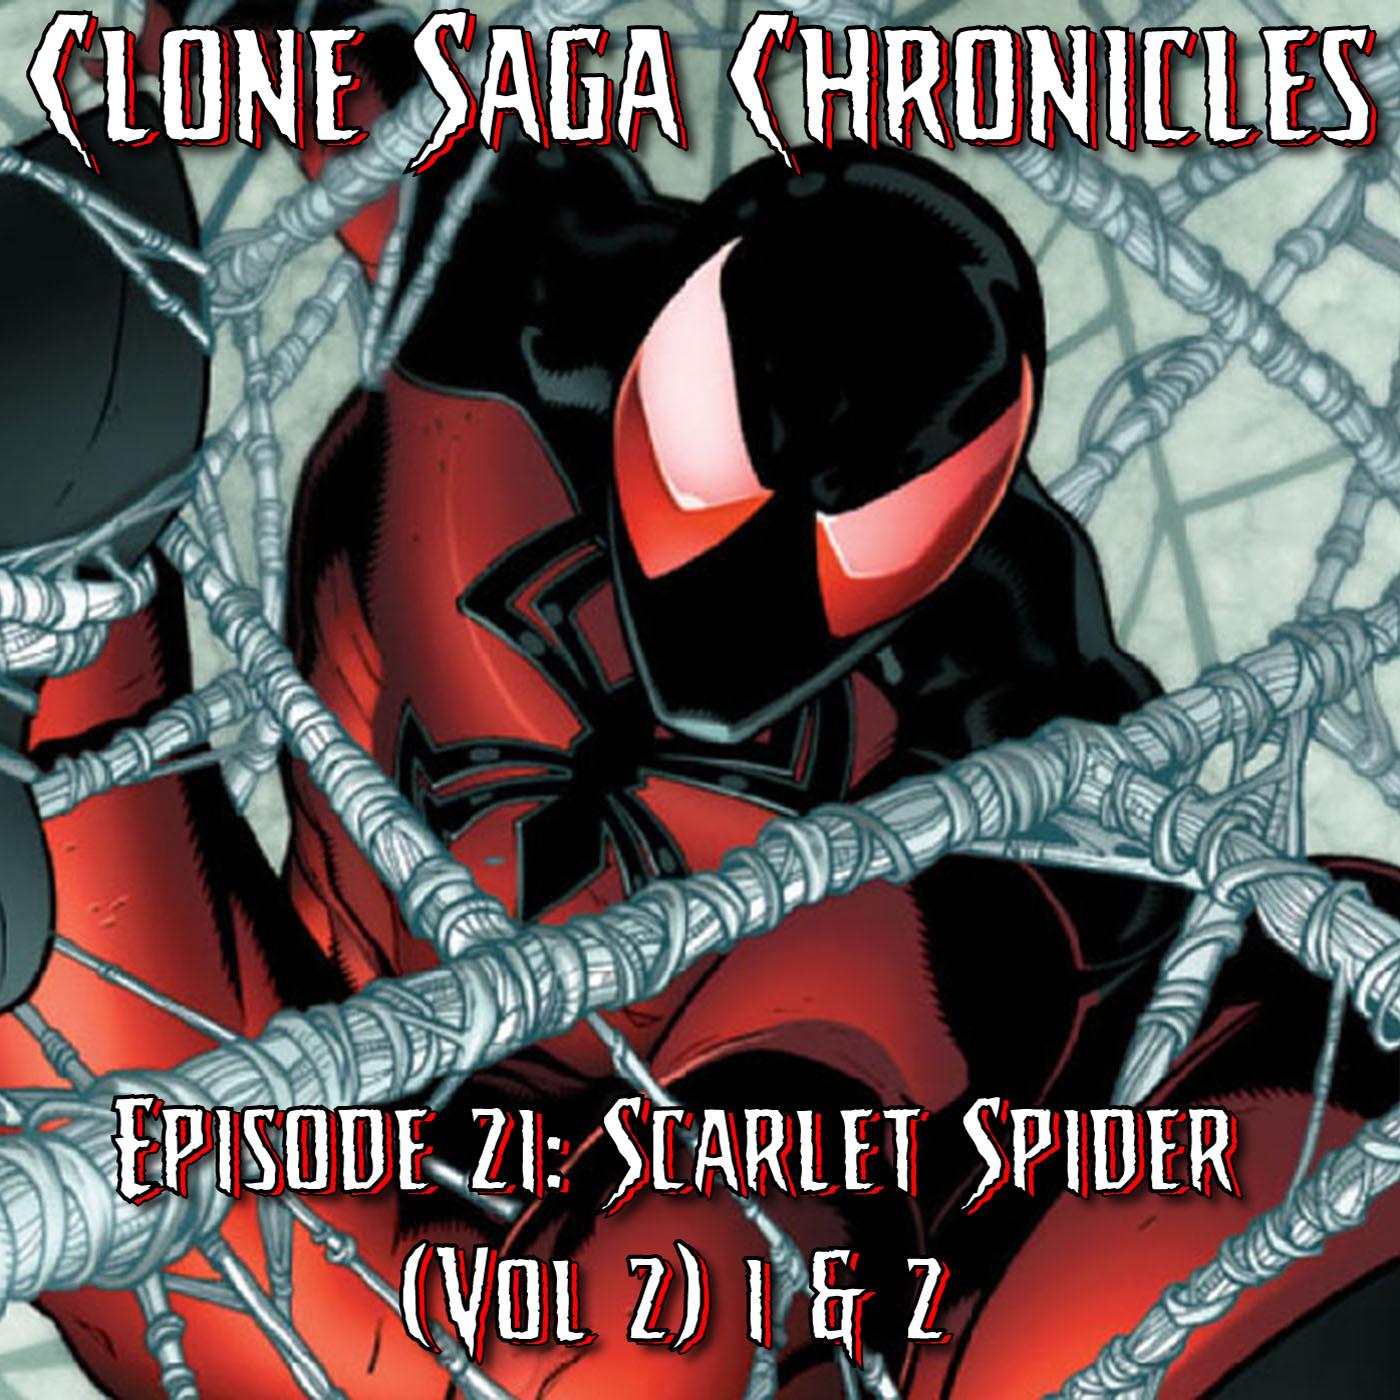 CSC Episode 21 Scarlet Spider (Vol II) #1 & #2 (Jan/Feb 2012)